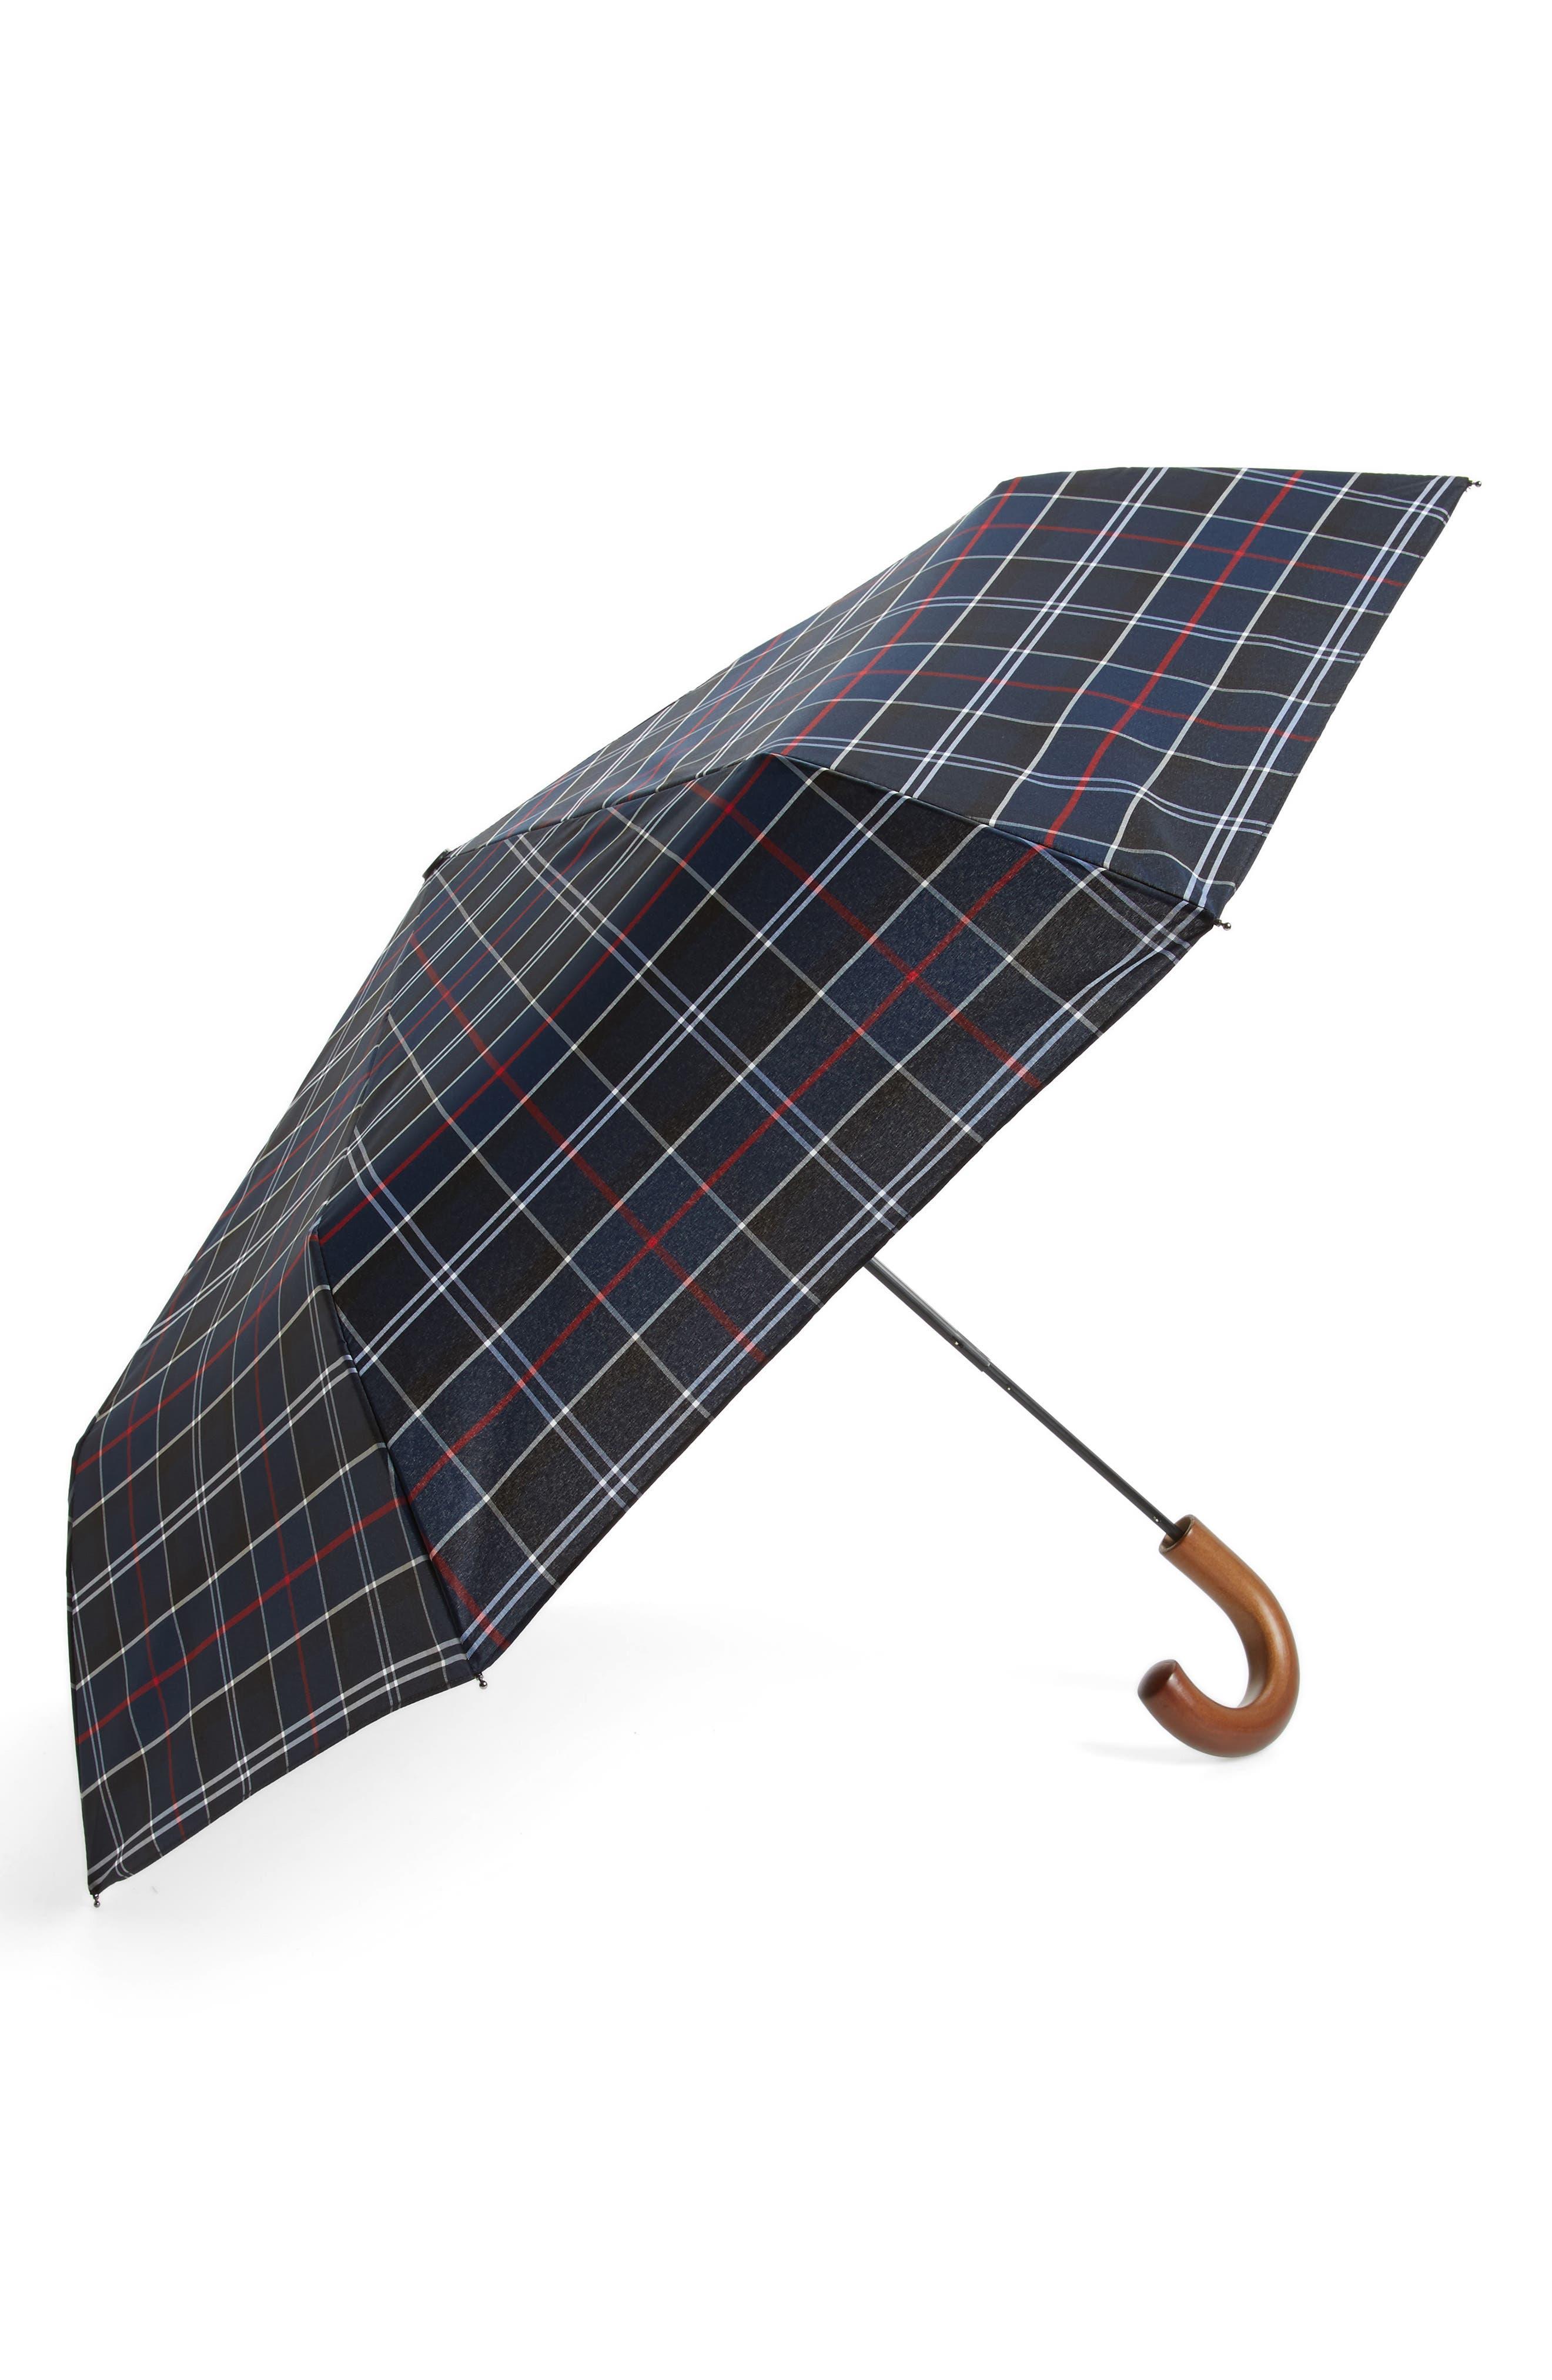 Telescoping Tartan Umbrella,                         Main,                         color, NAVY TARTAN